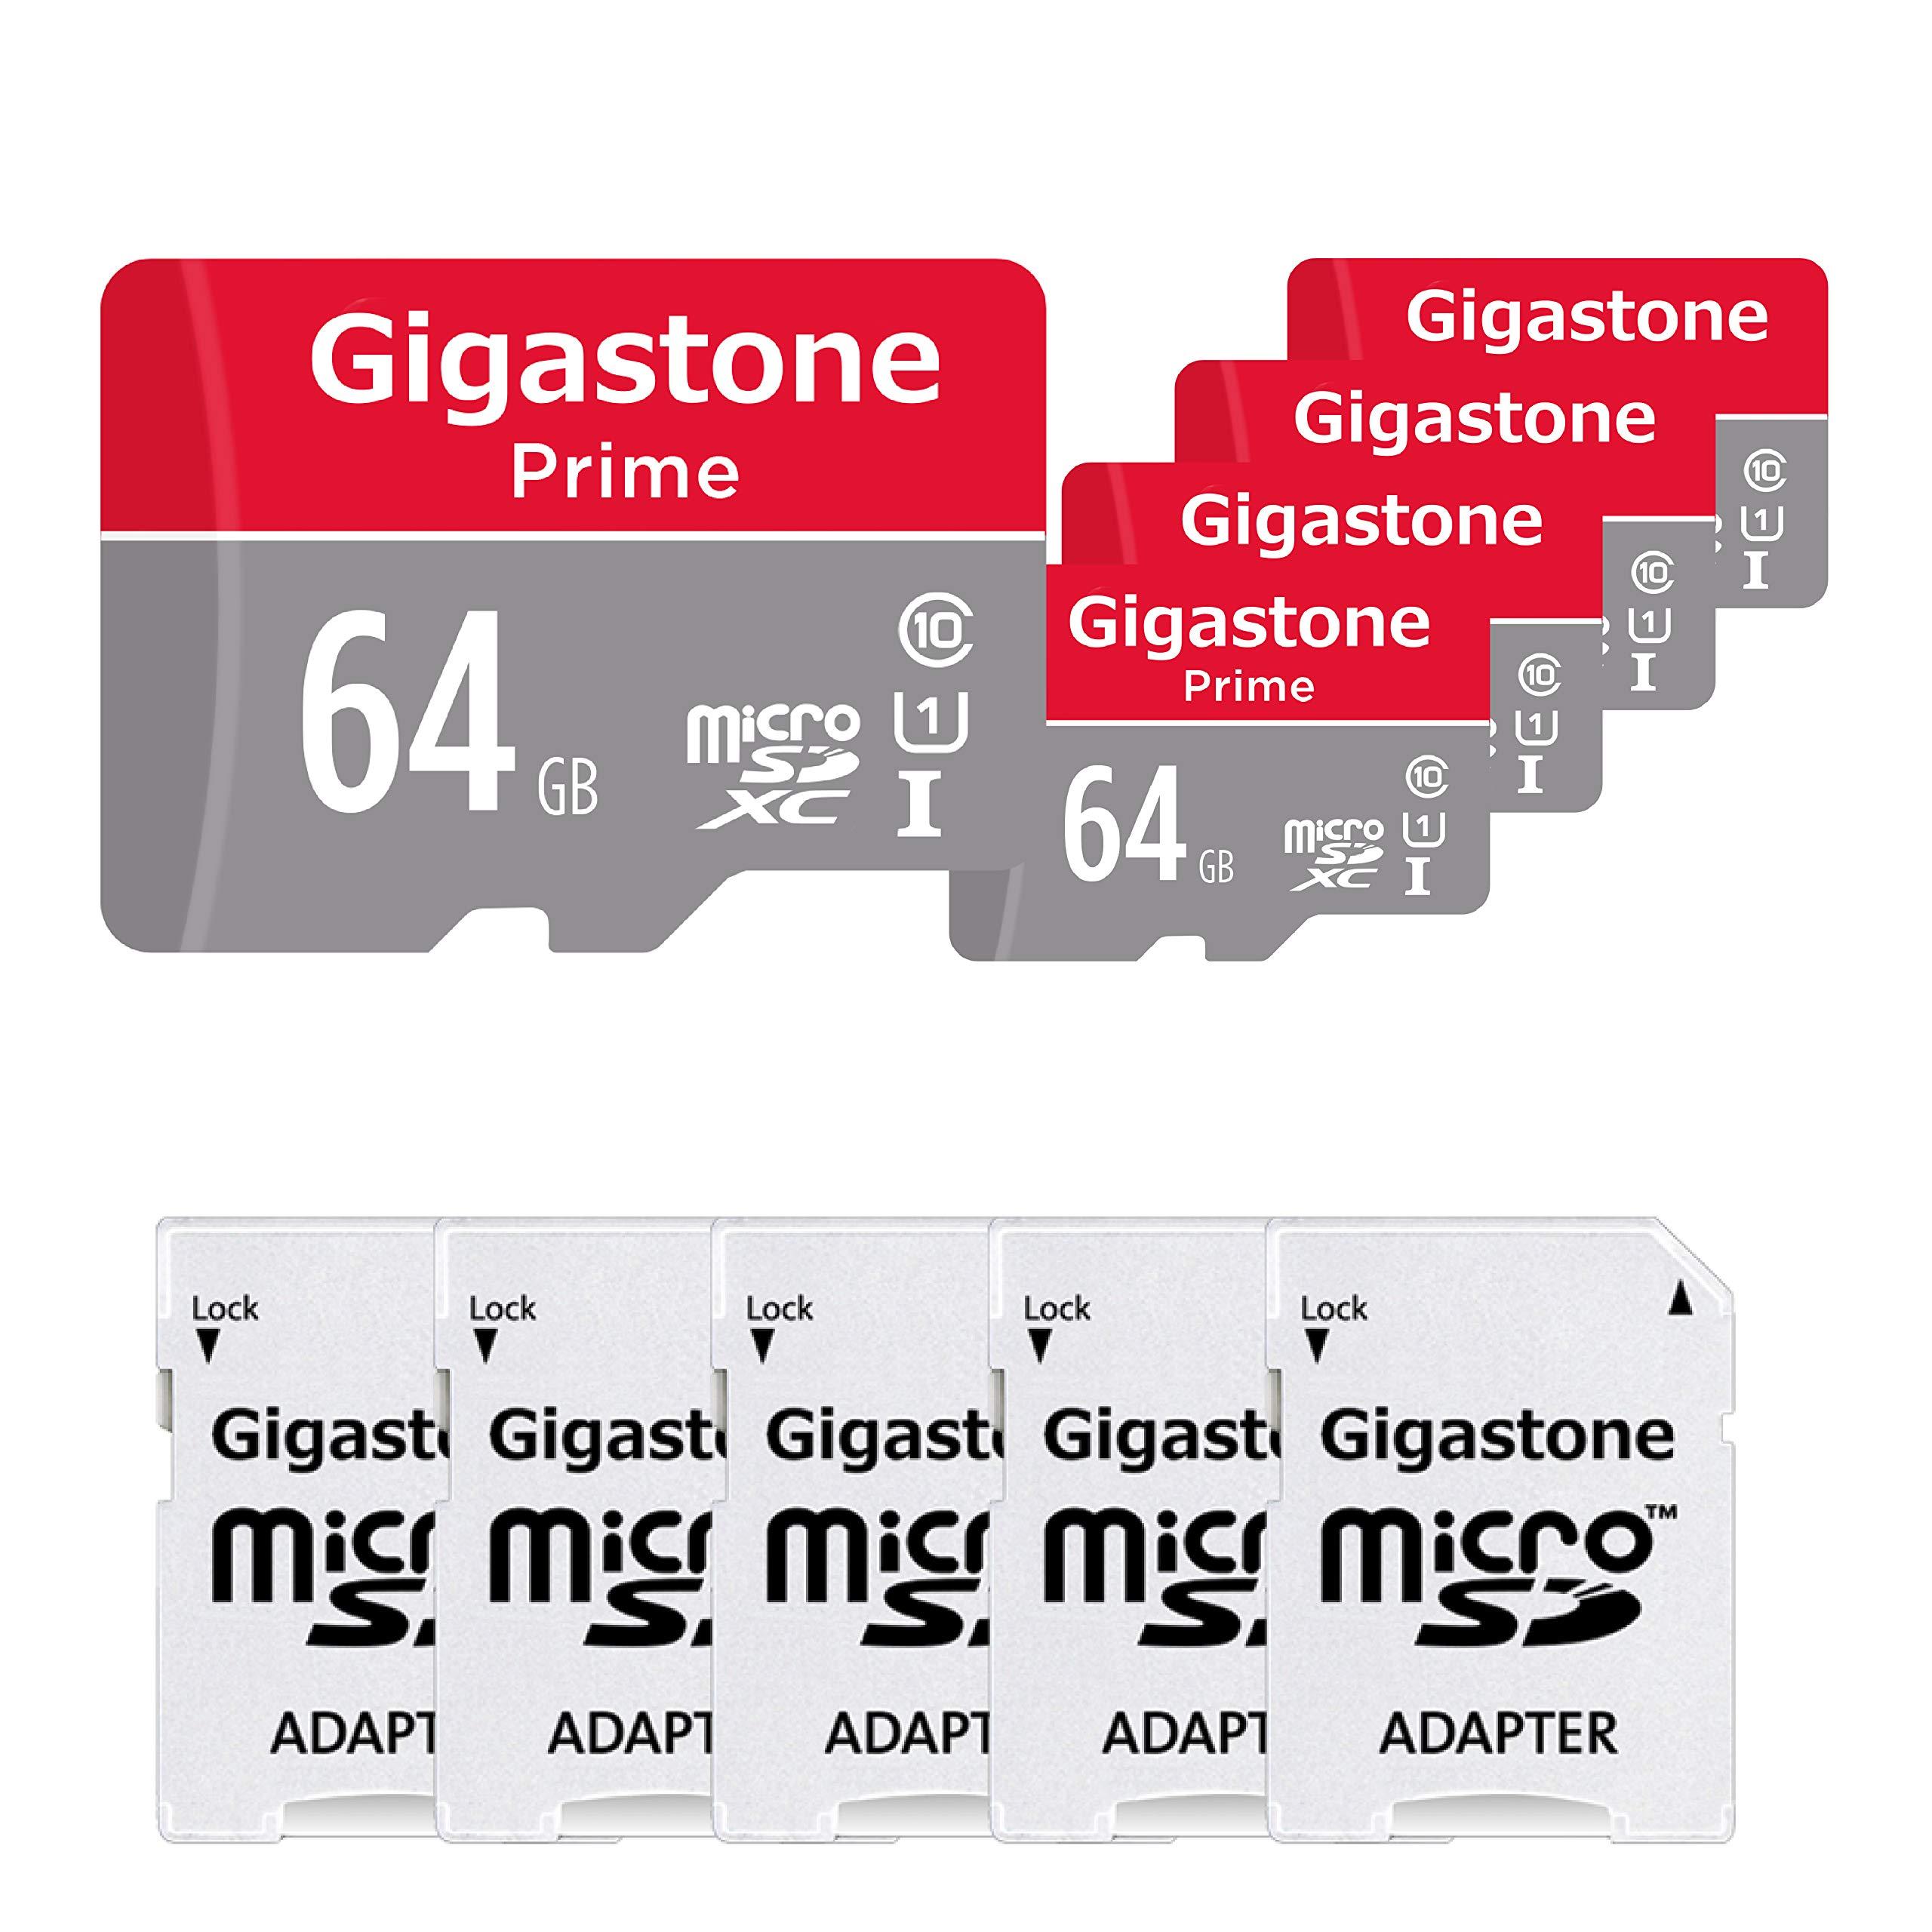 Gigastone Micro SD Card 64GB 5-Pack Micro SDXC U1 C10 with Mini Case and MicroSD SD Adapter High Speed Memory Card C10 Class 10 UHS-I Full HD Video Nintendo Gopro Camera Samsung Canon Nikon DJI Drone by Gigastone